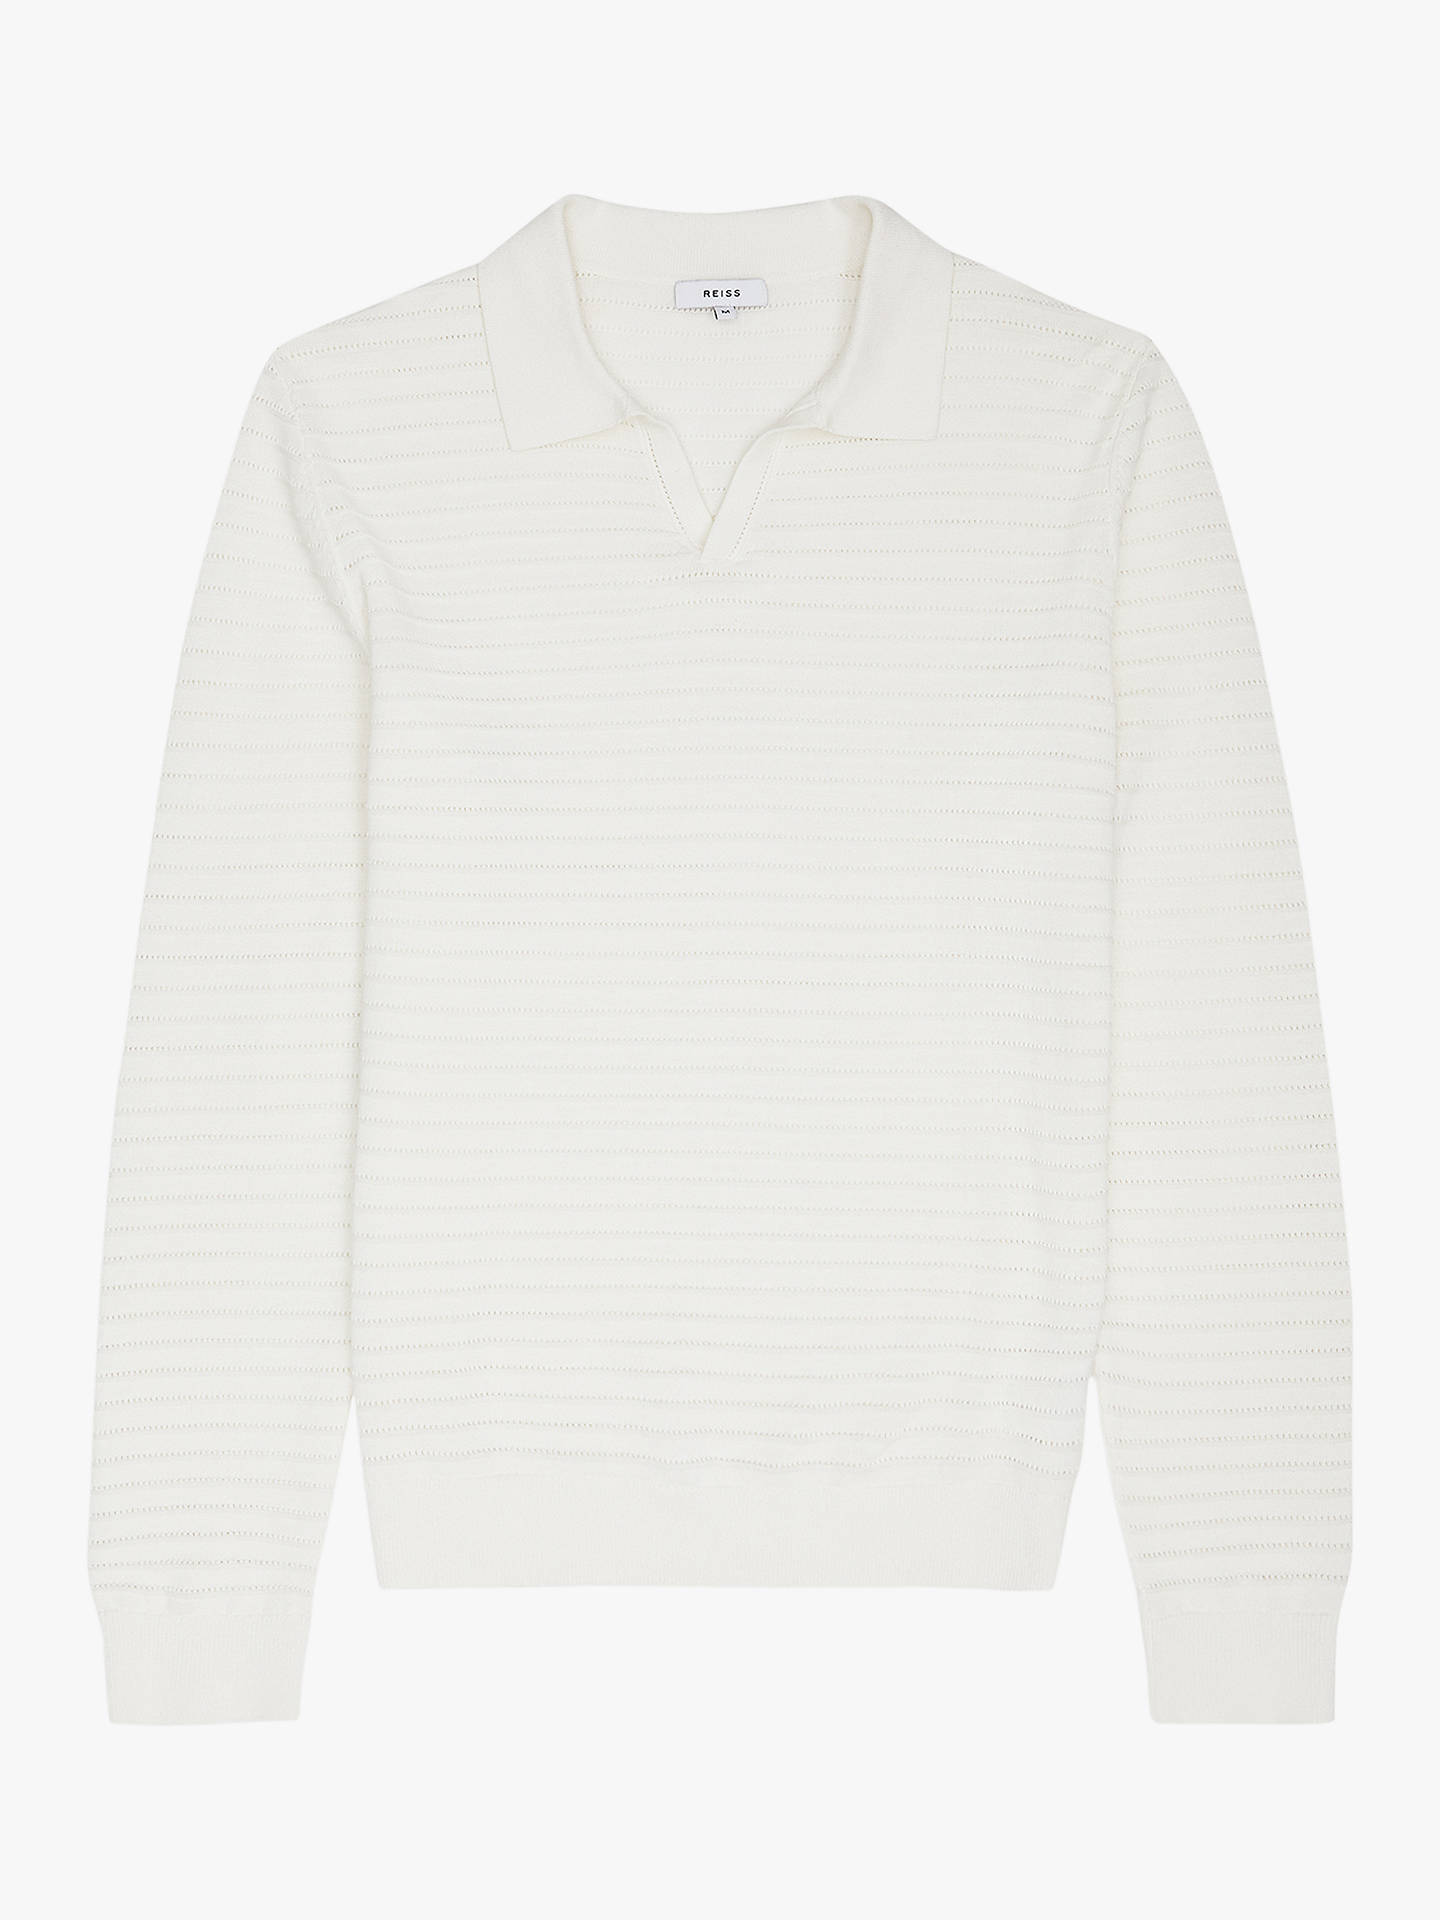 79d71a75ca81 ... Buy Reiss Patterson Long Sleeve Open Collar Polo Shirt